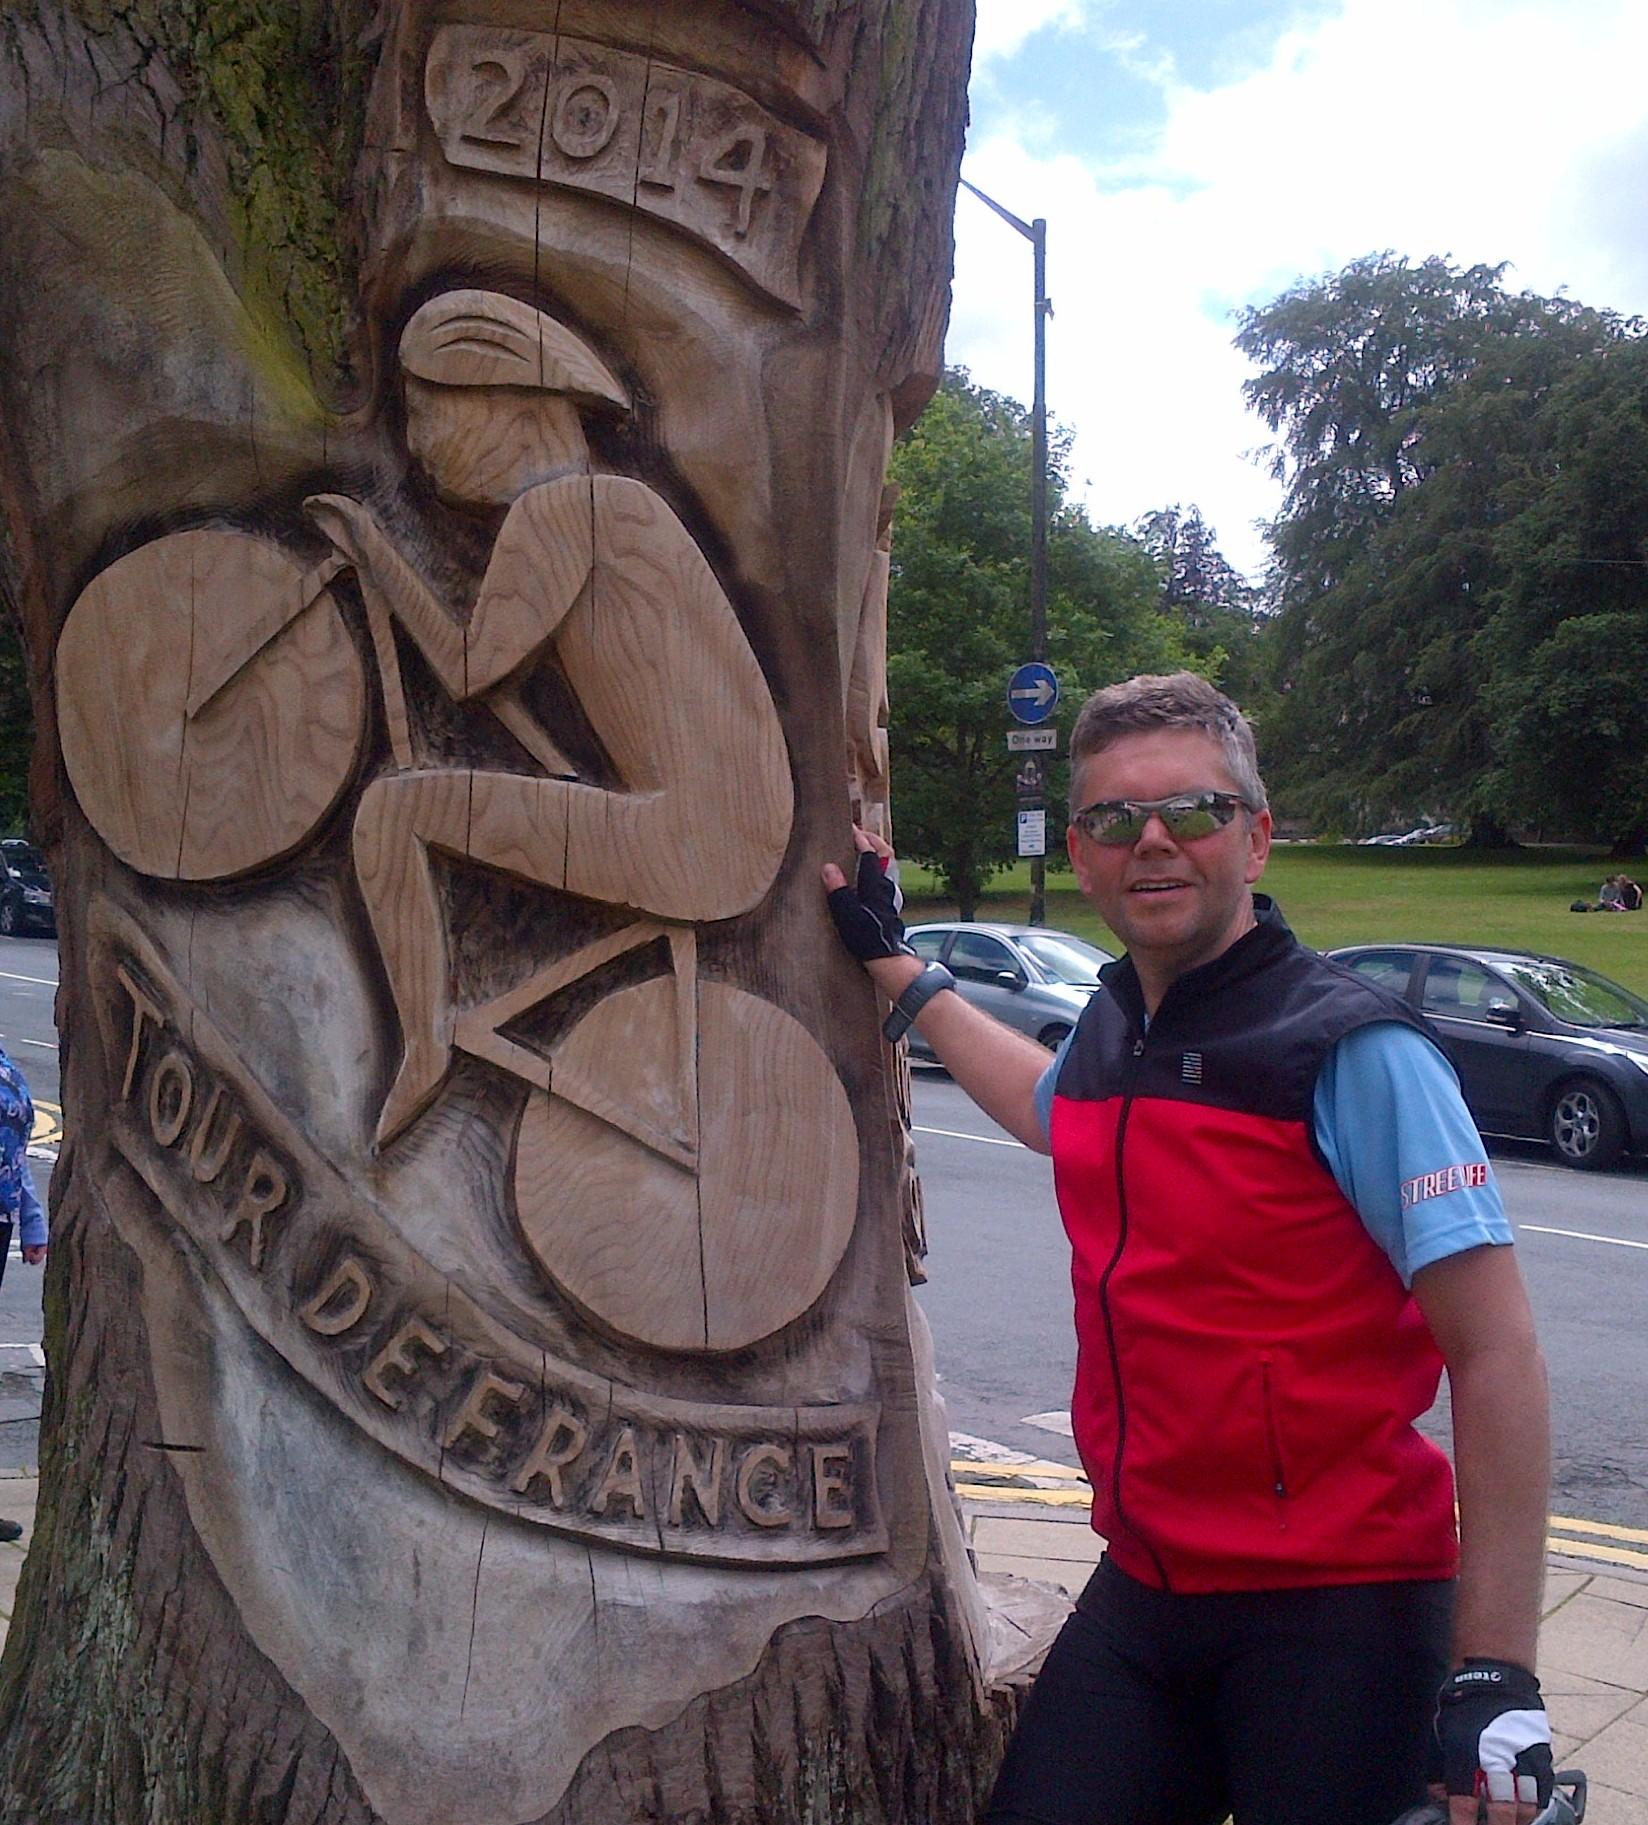 John at the Tour de France stage 1 finish line in Harrogate.